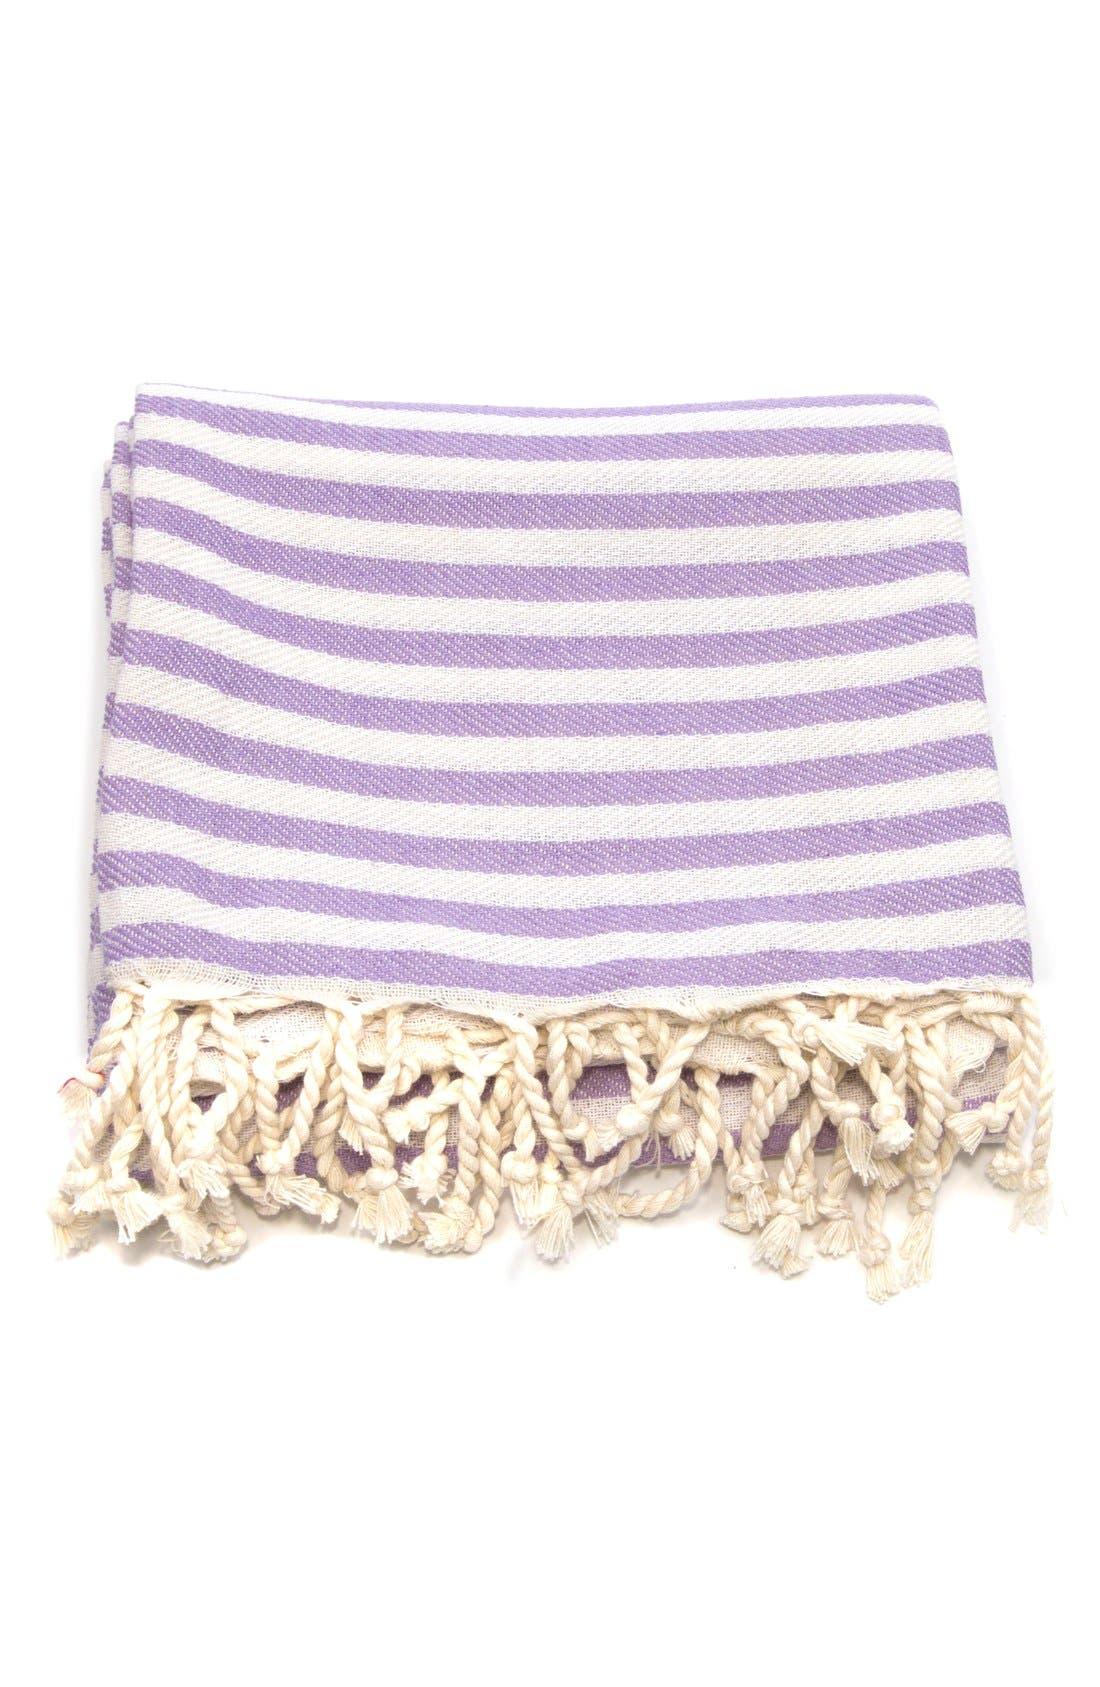 'Fun in the Sun' Turkish Pestemal Towel,                             Alternate thumbnail 3, color,                             Lilac